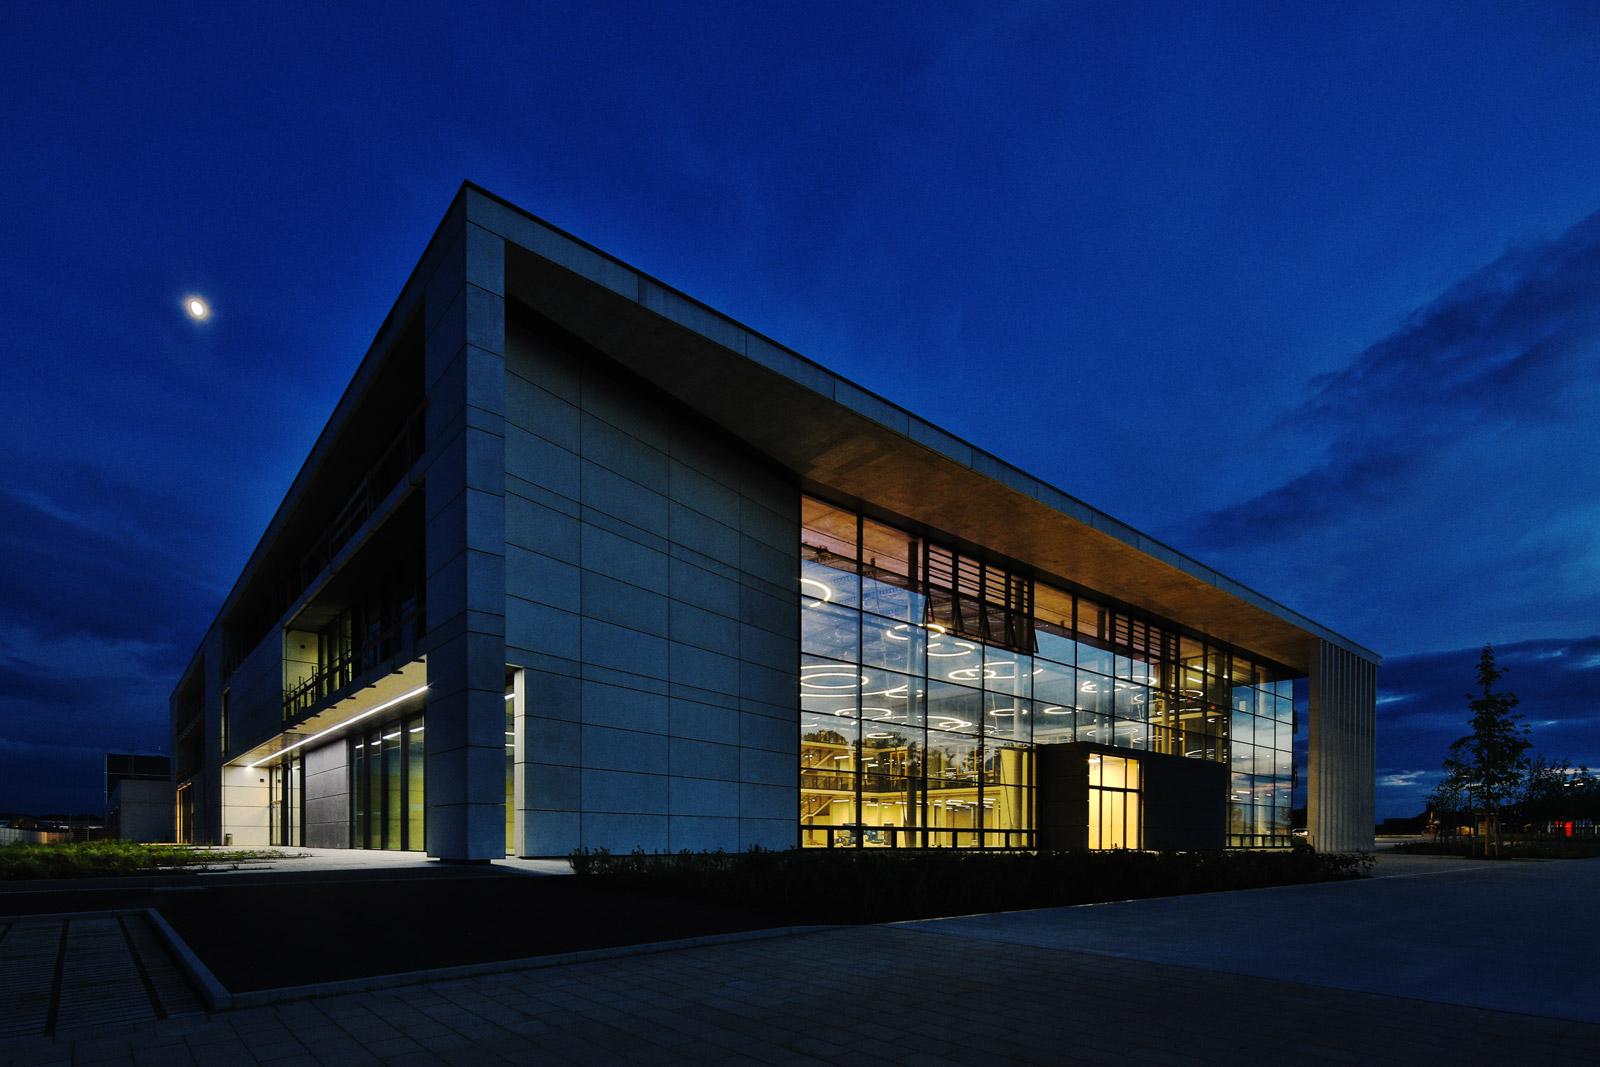 DIA179 German Industry Architecture Solarlux Campus Nacht